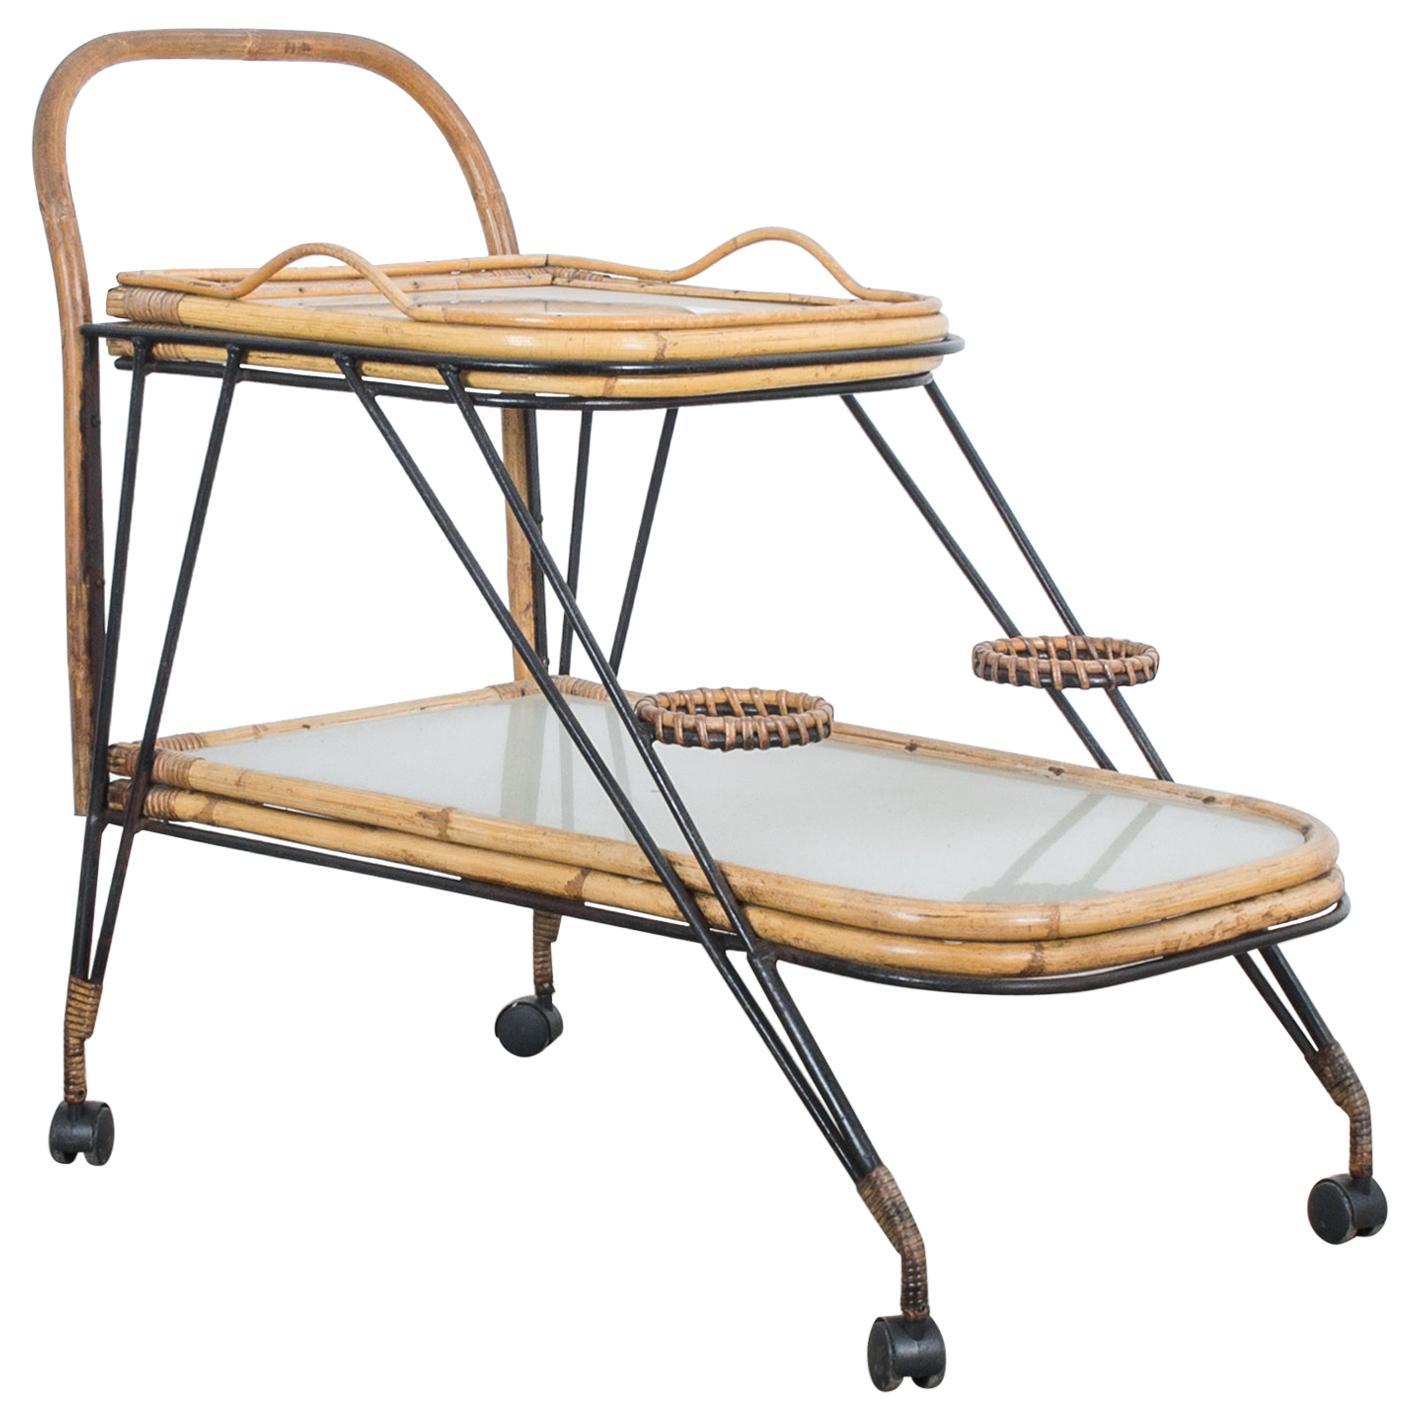 1960s Midcentury Rattan Bar Cart